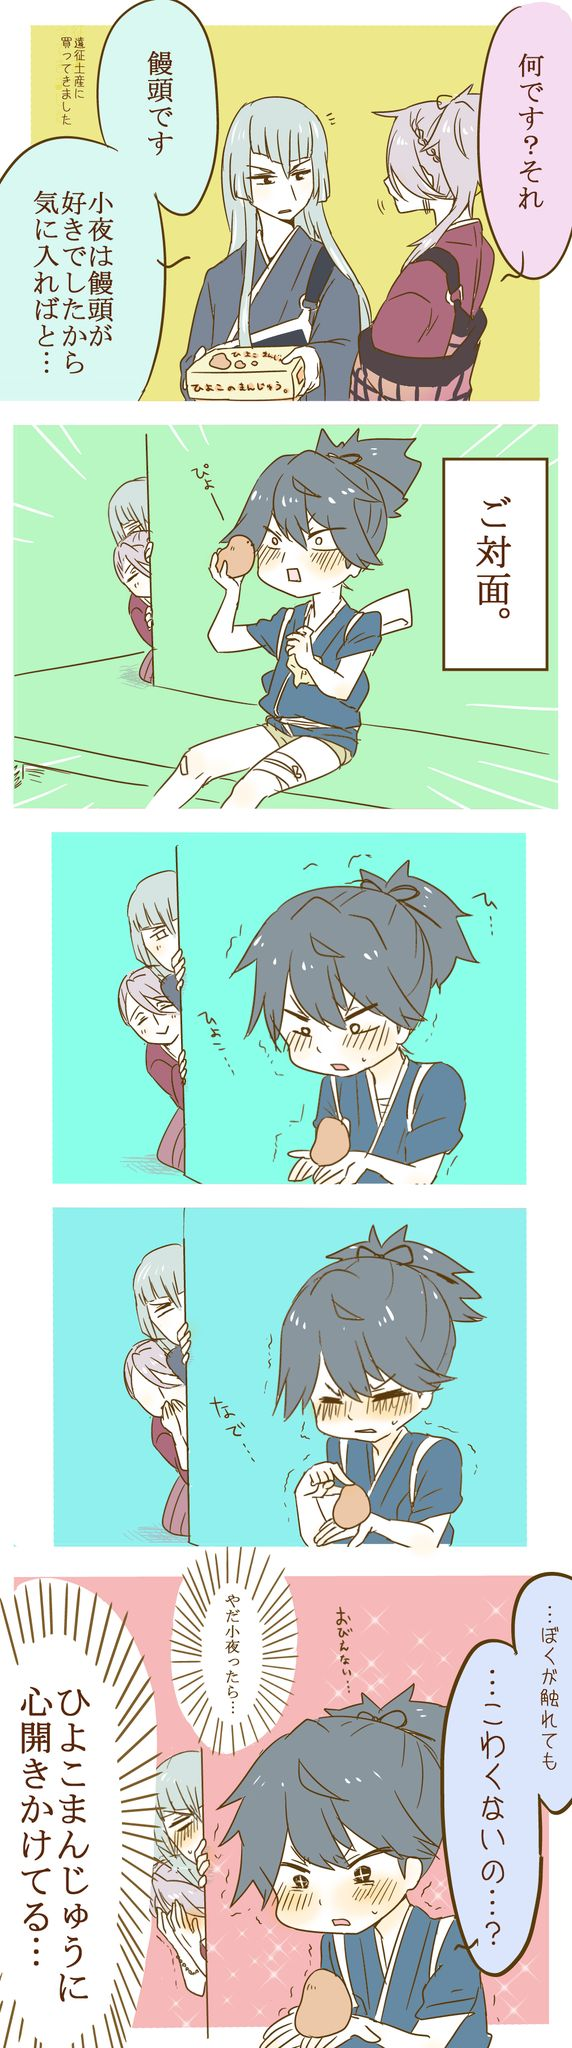 This is just so cute - Touken Ranbu